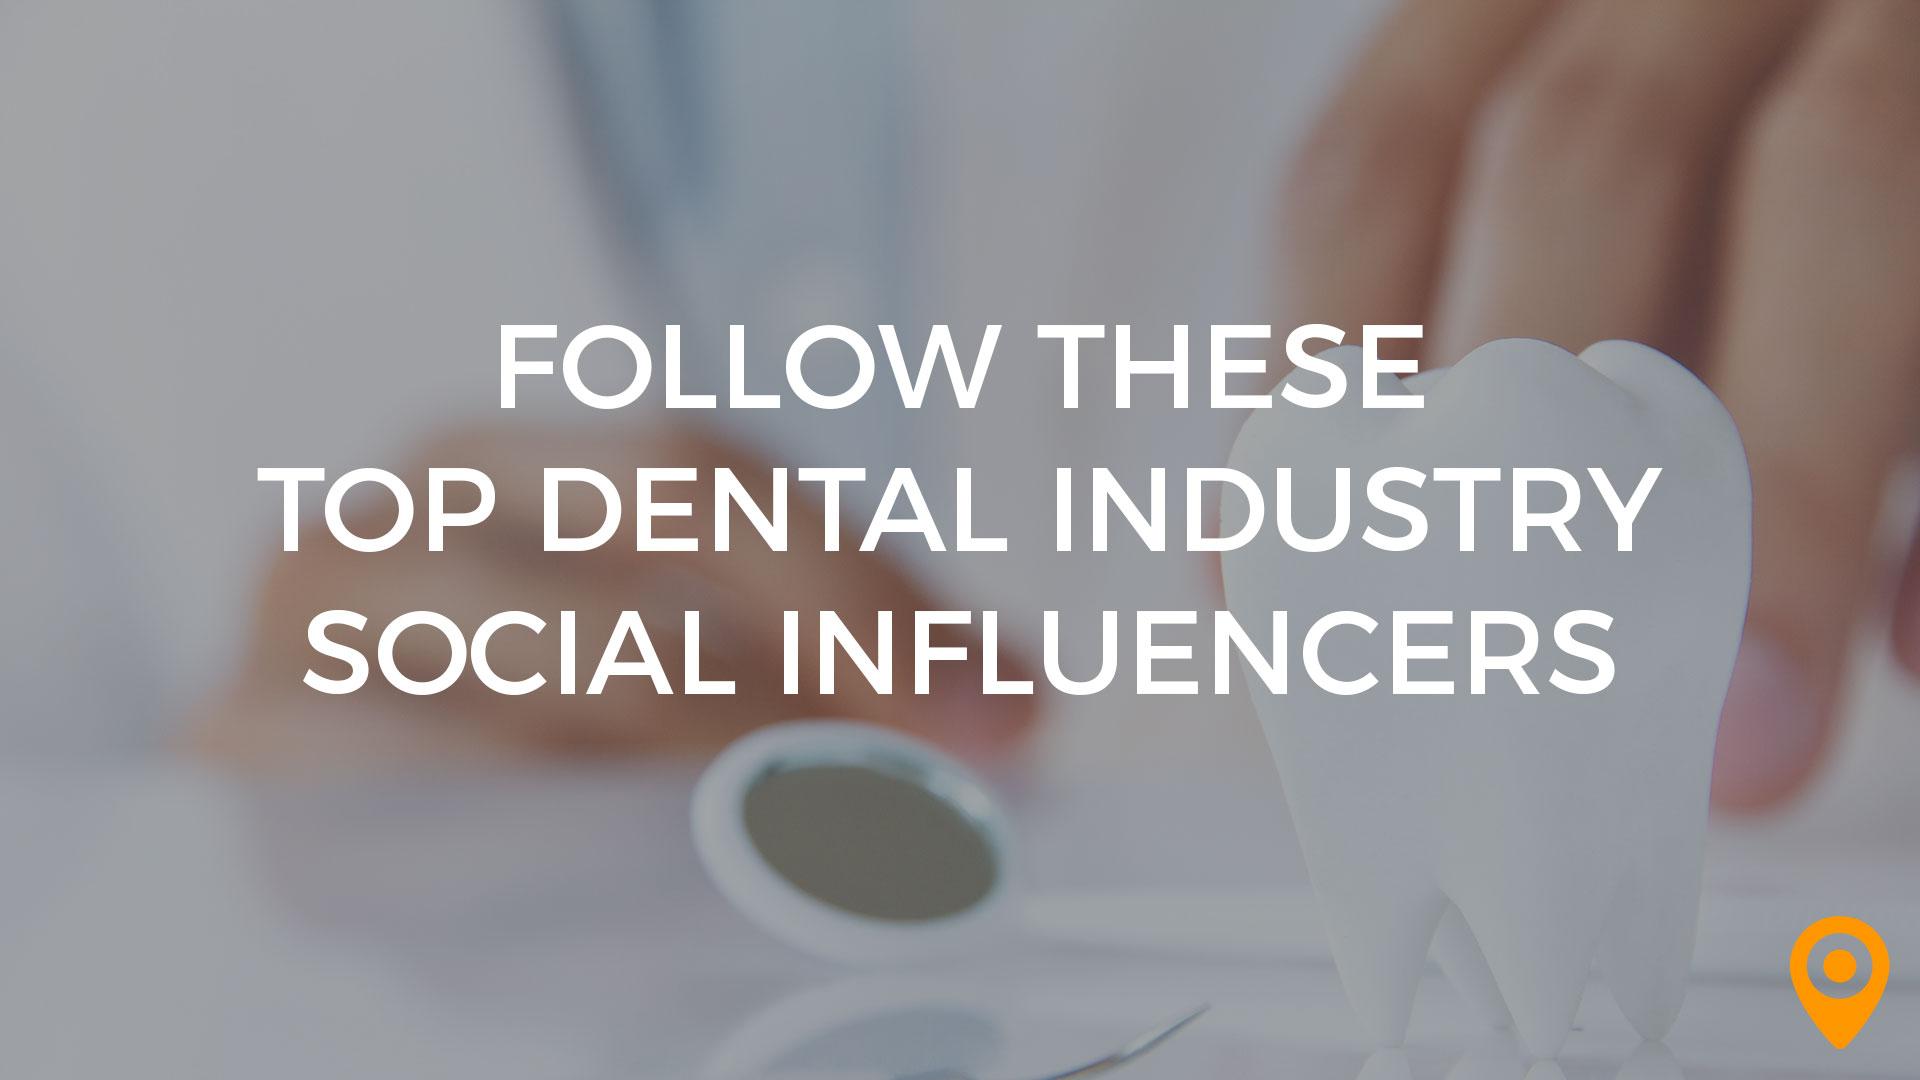 Top Dental Industry Social Influencers